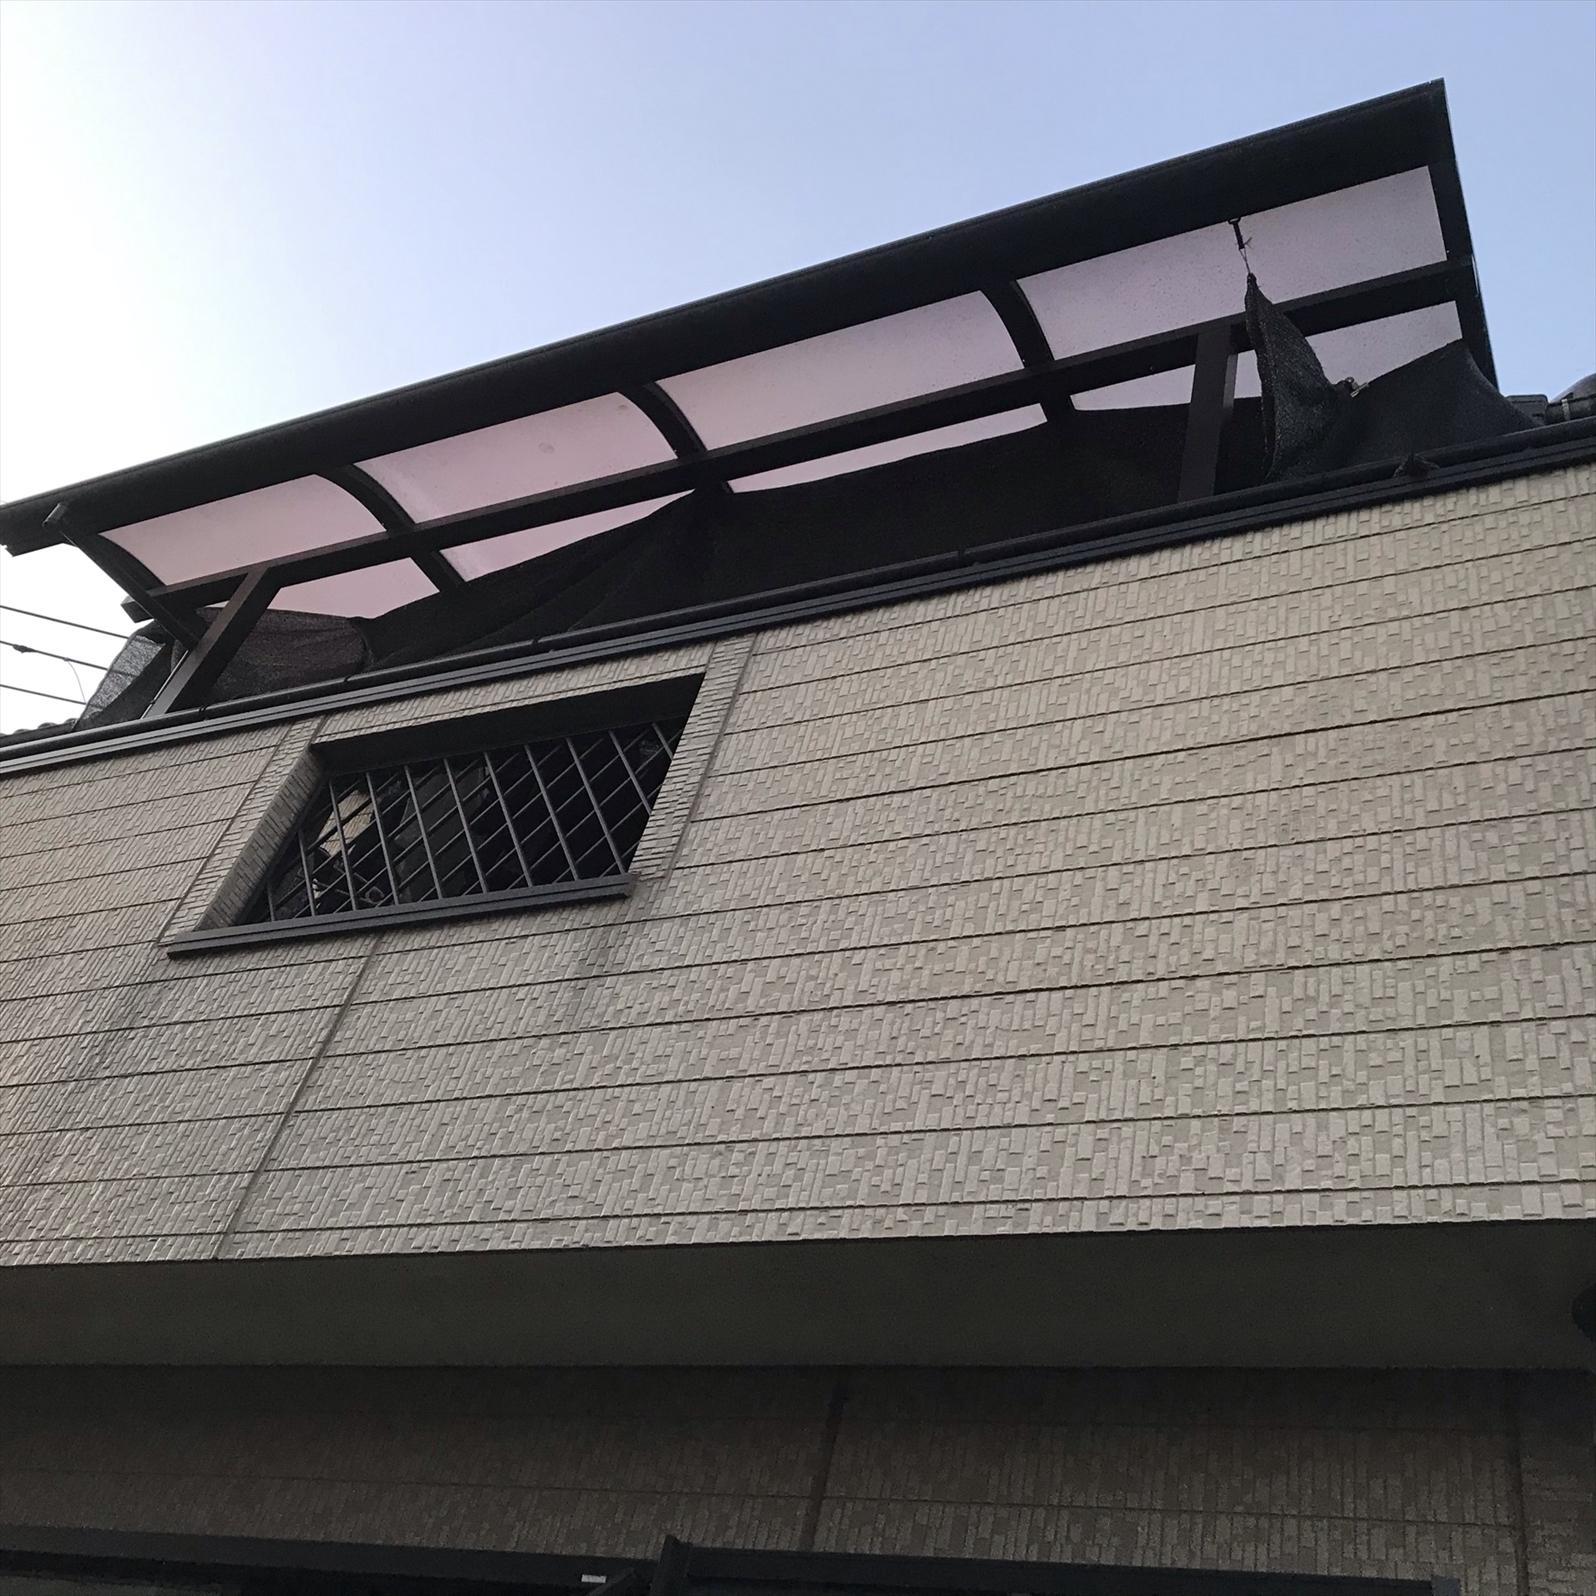 上尾市原市の外壁塗装の為無料点検